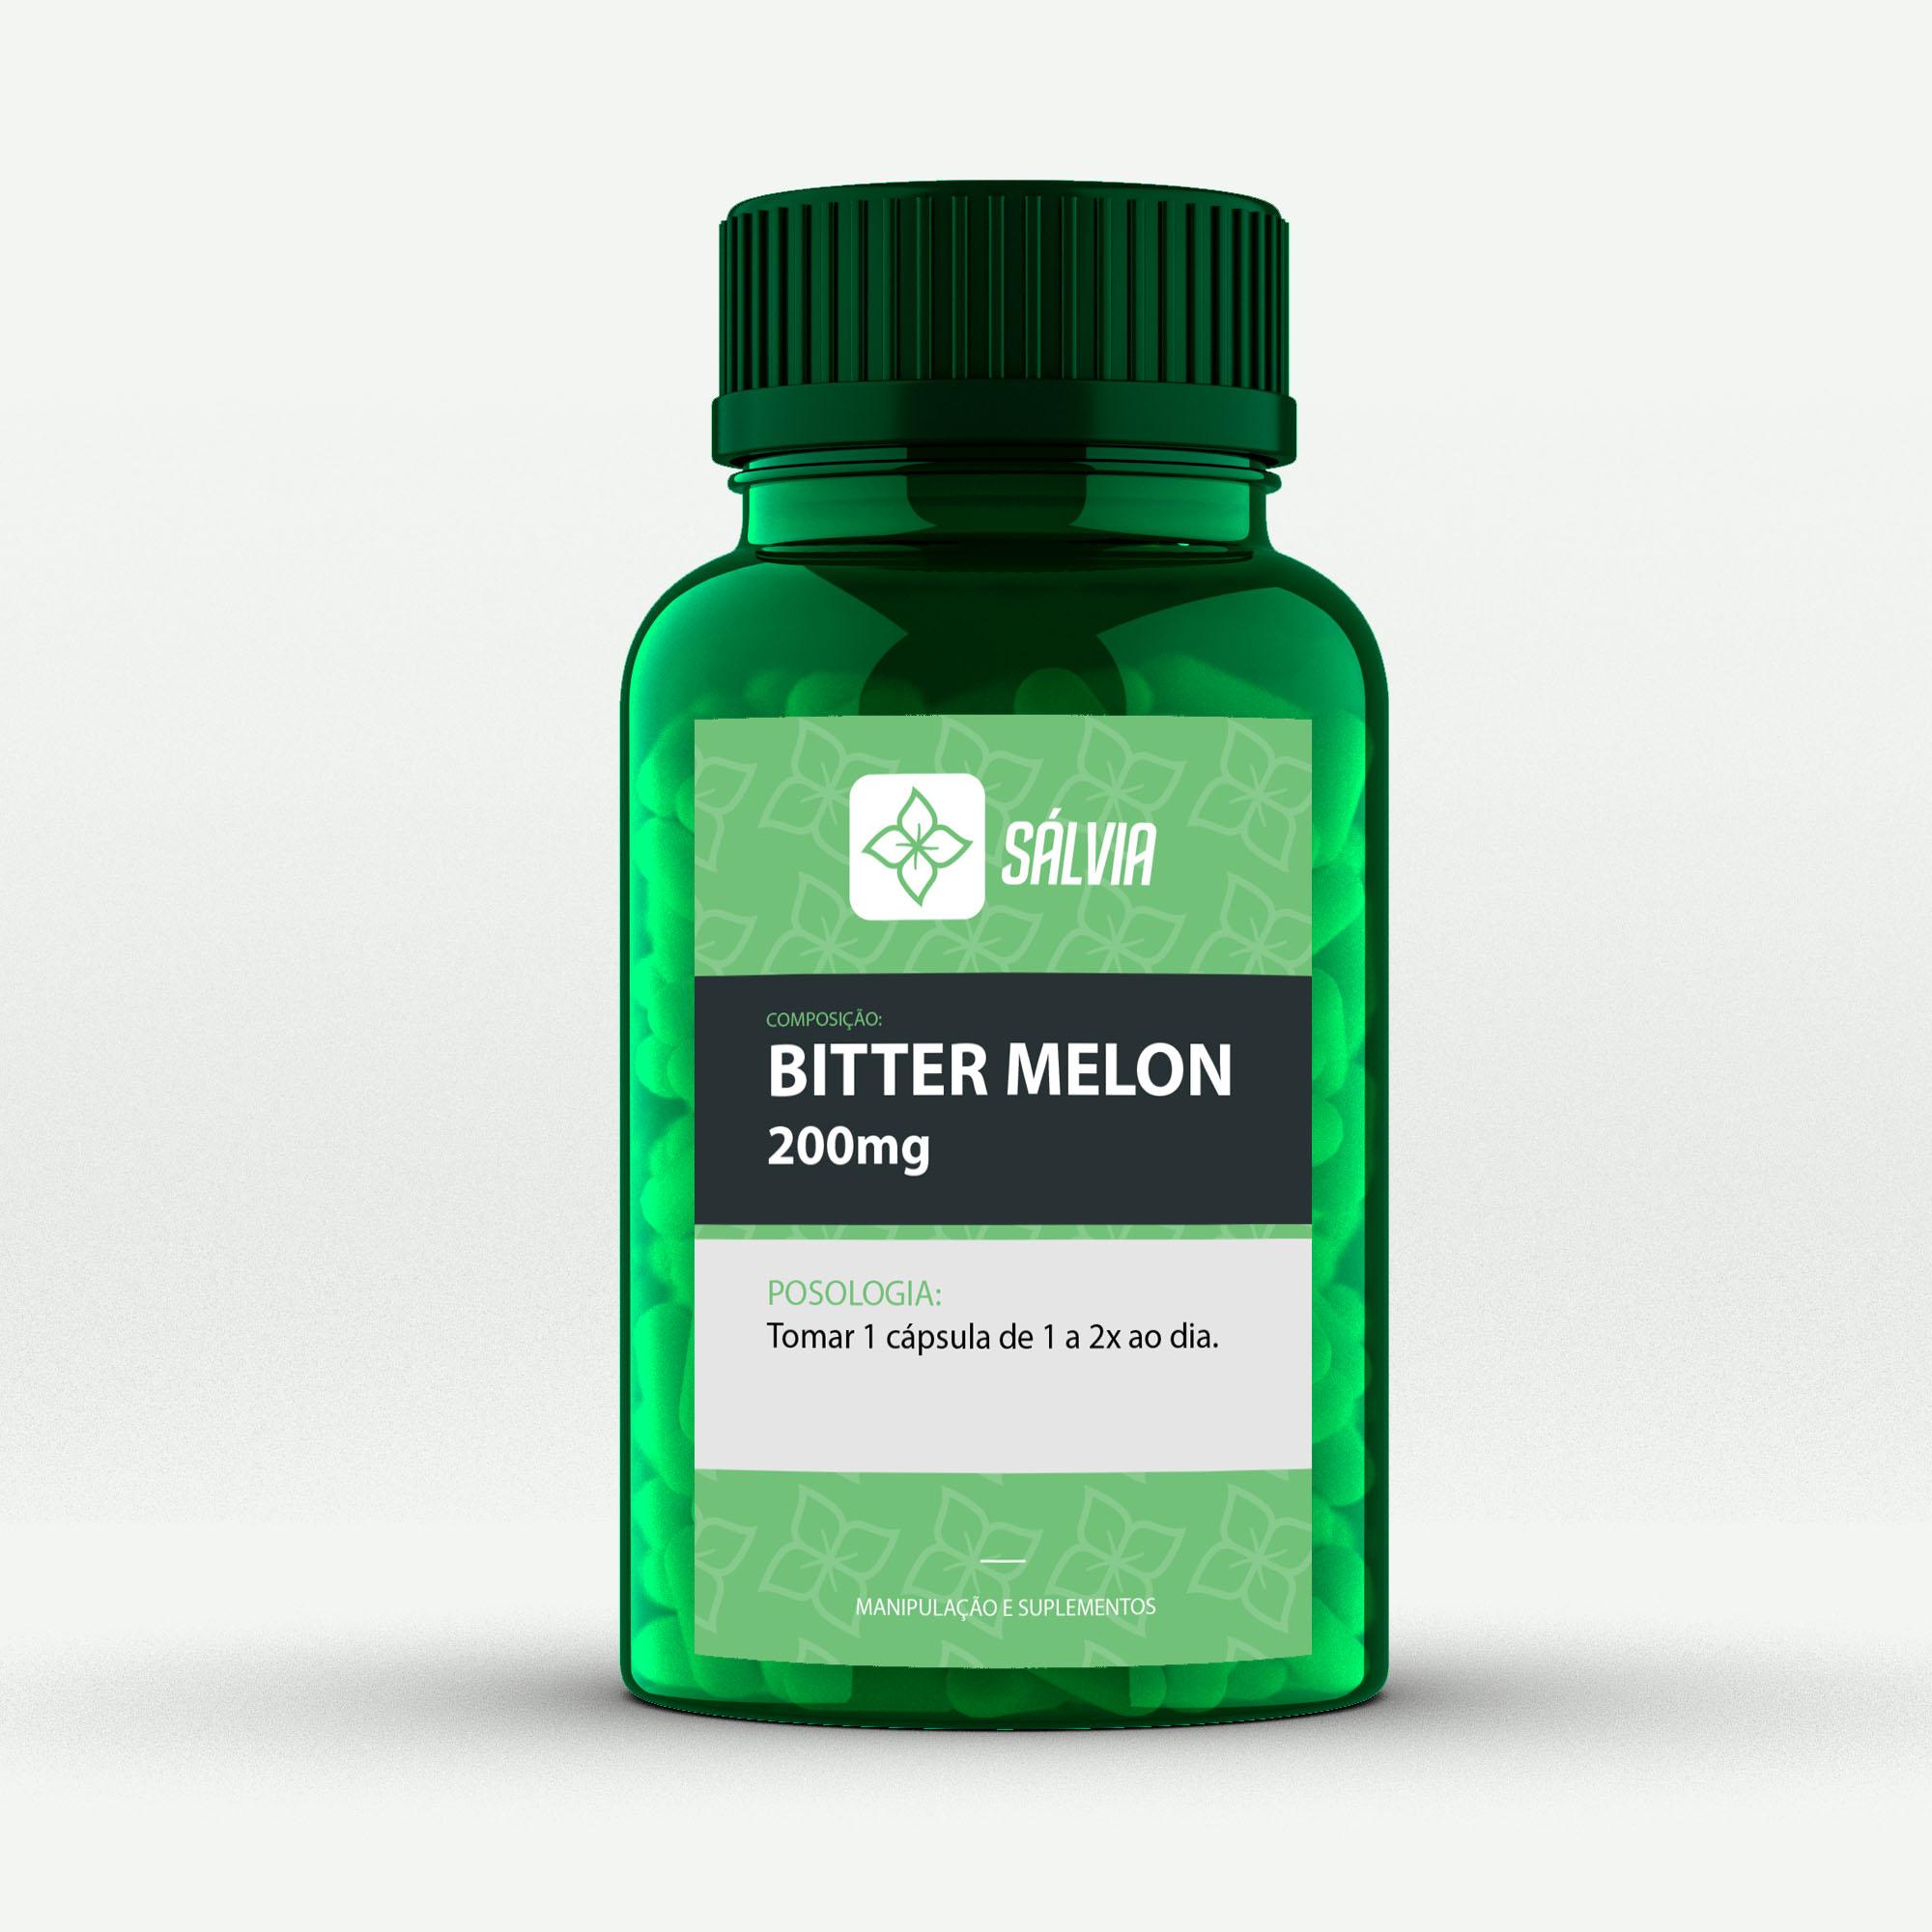 BITTER MELON 200mg - Cápsulas